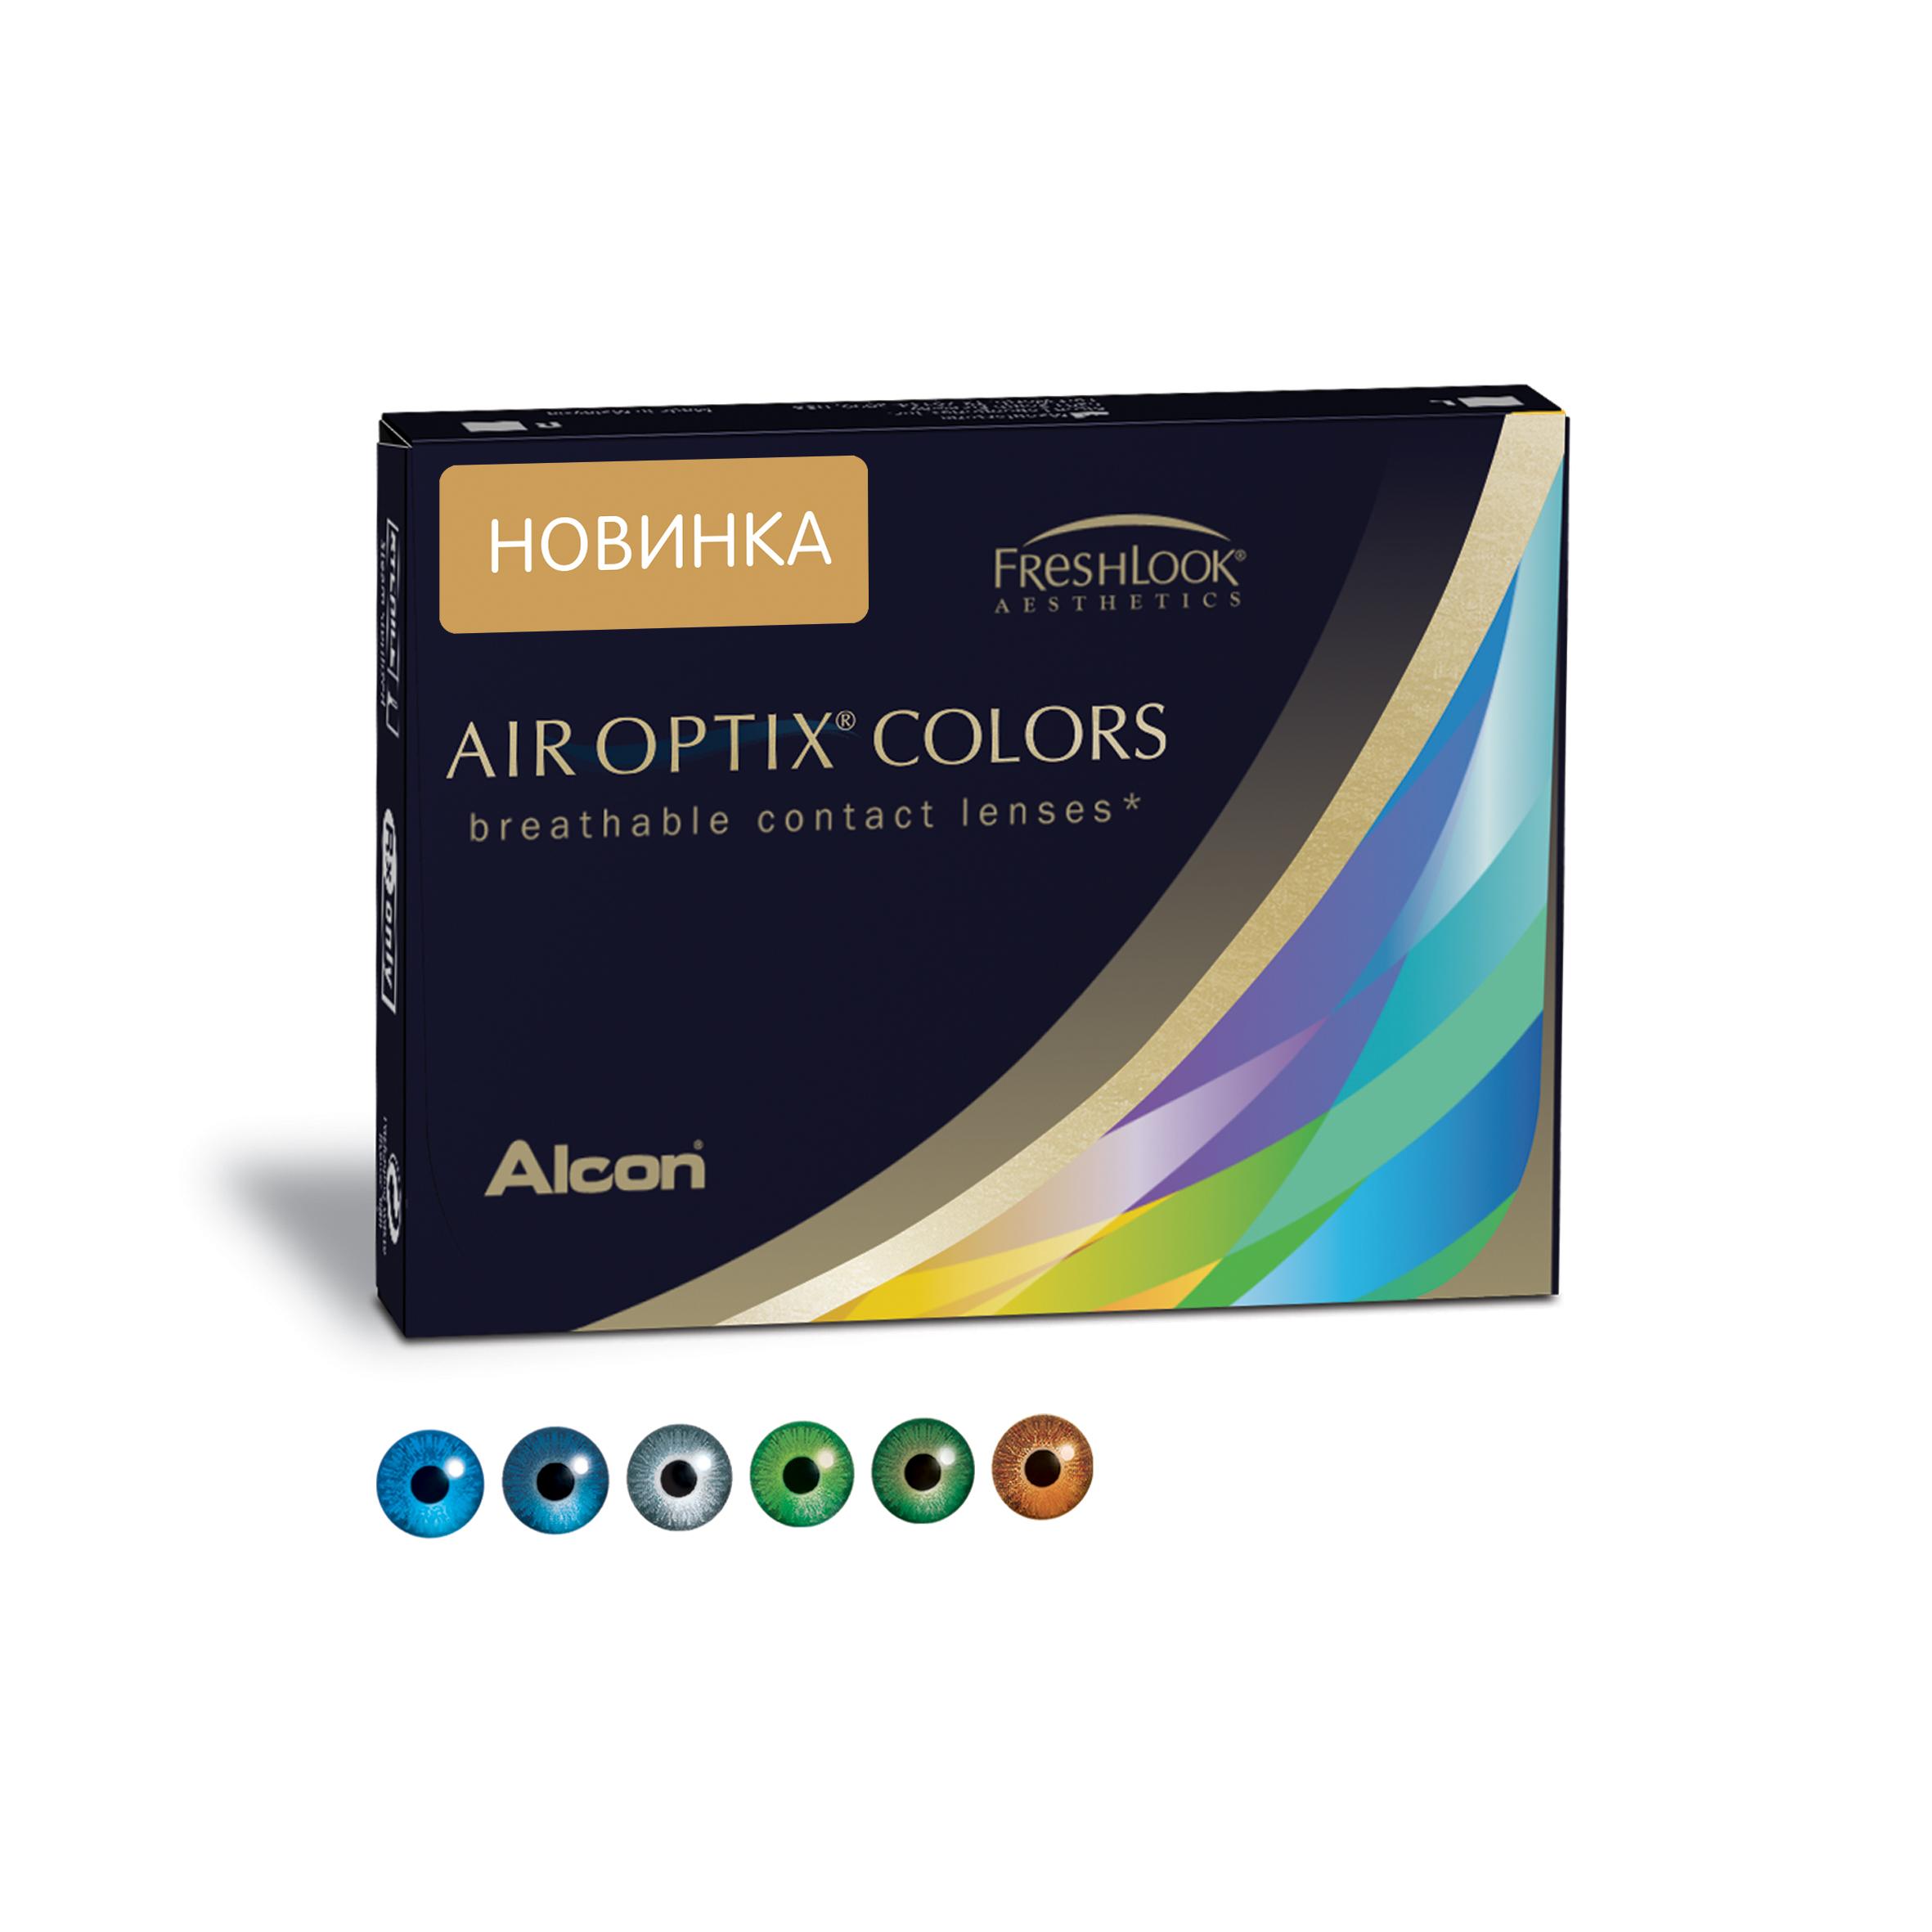 Аlcon контактные линзы Air Optix Colors 2 шт -4.25 Brilliant Blue31746239Мягкие контактные линзы